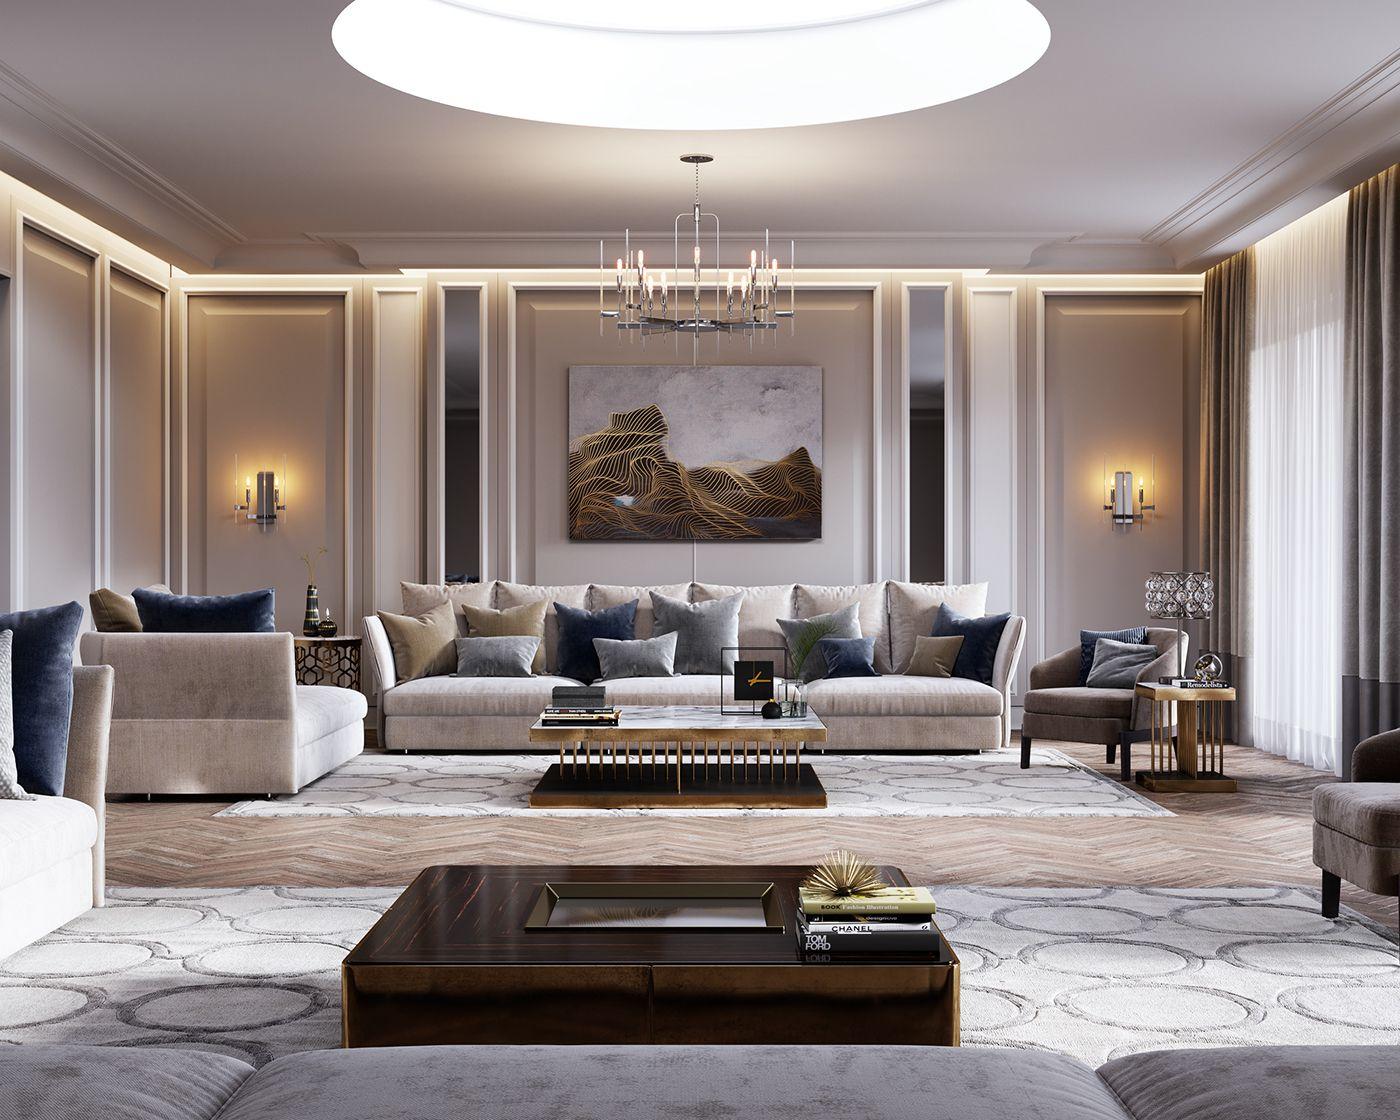 Apartments in Saudi Arabia (Part 1)Design and Visualization: VizLine Studio